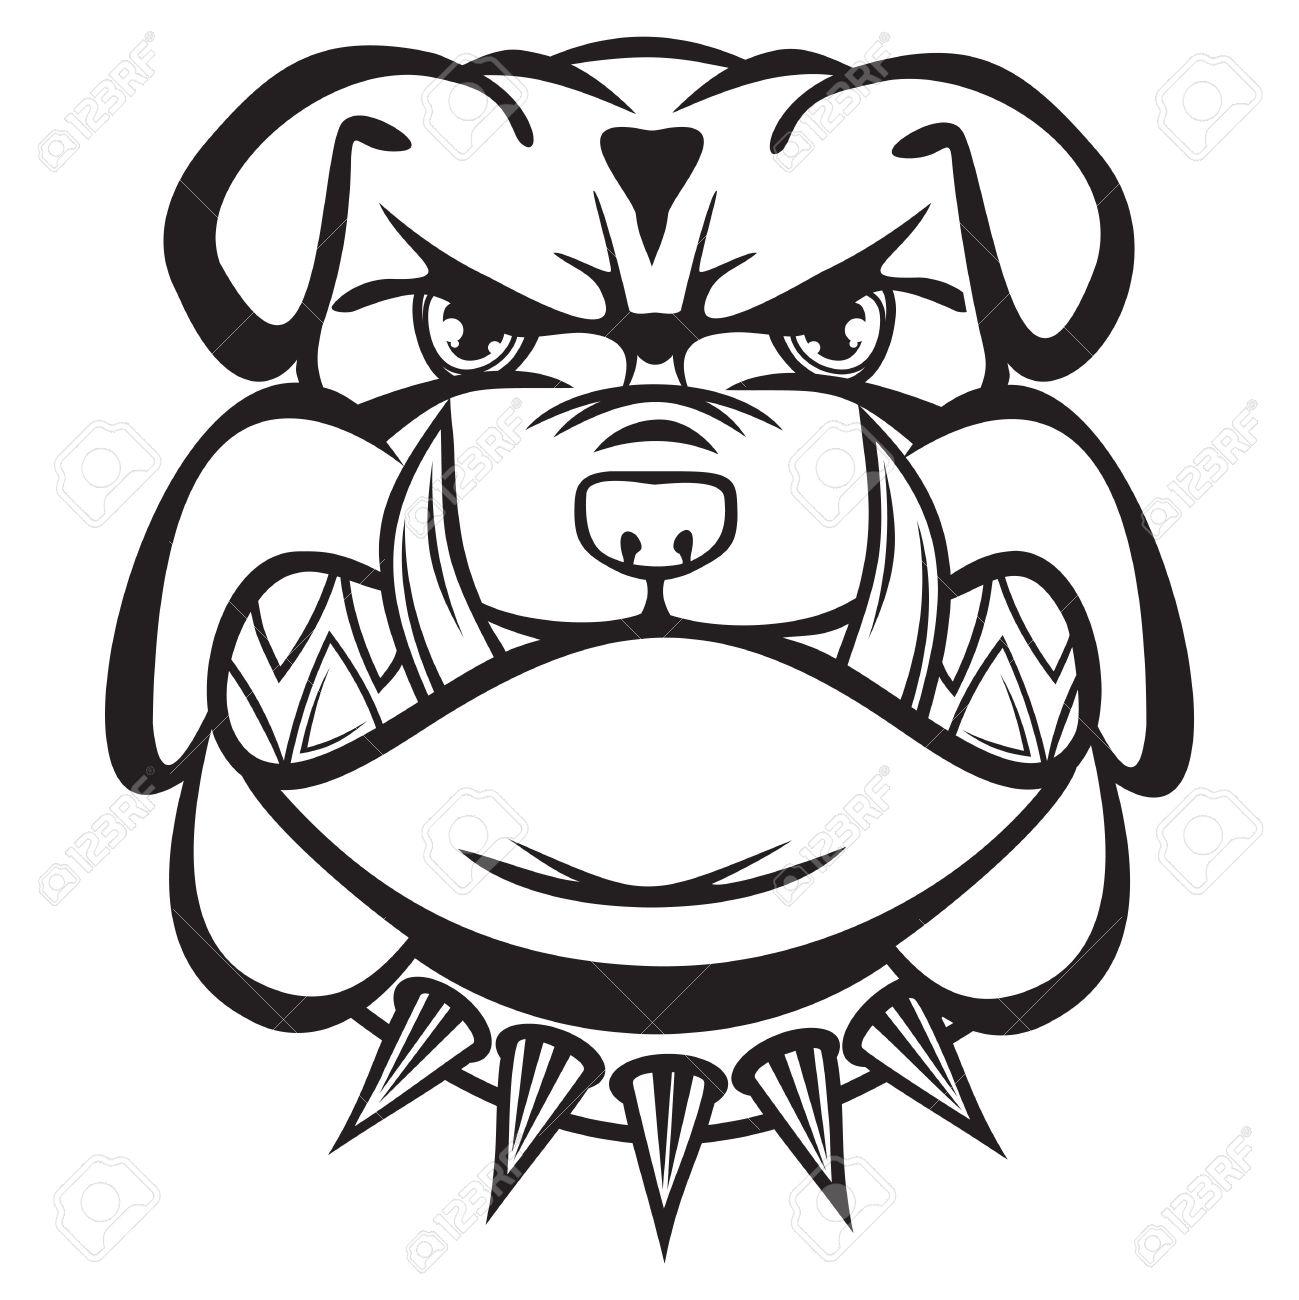 1299x1300 Bulldog Clipart Pitbull